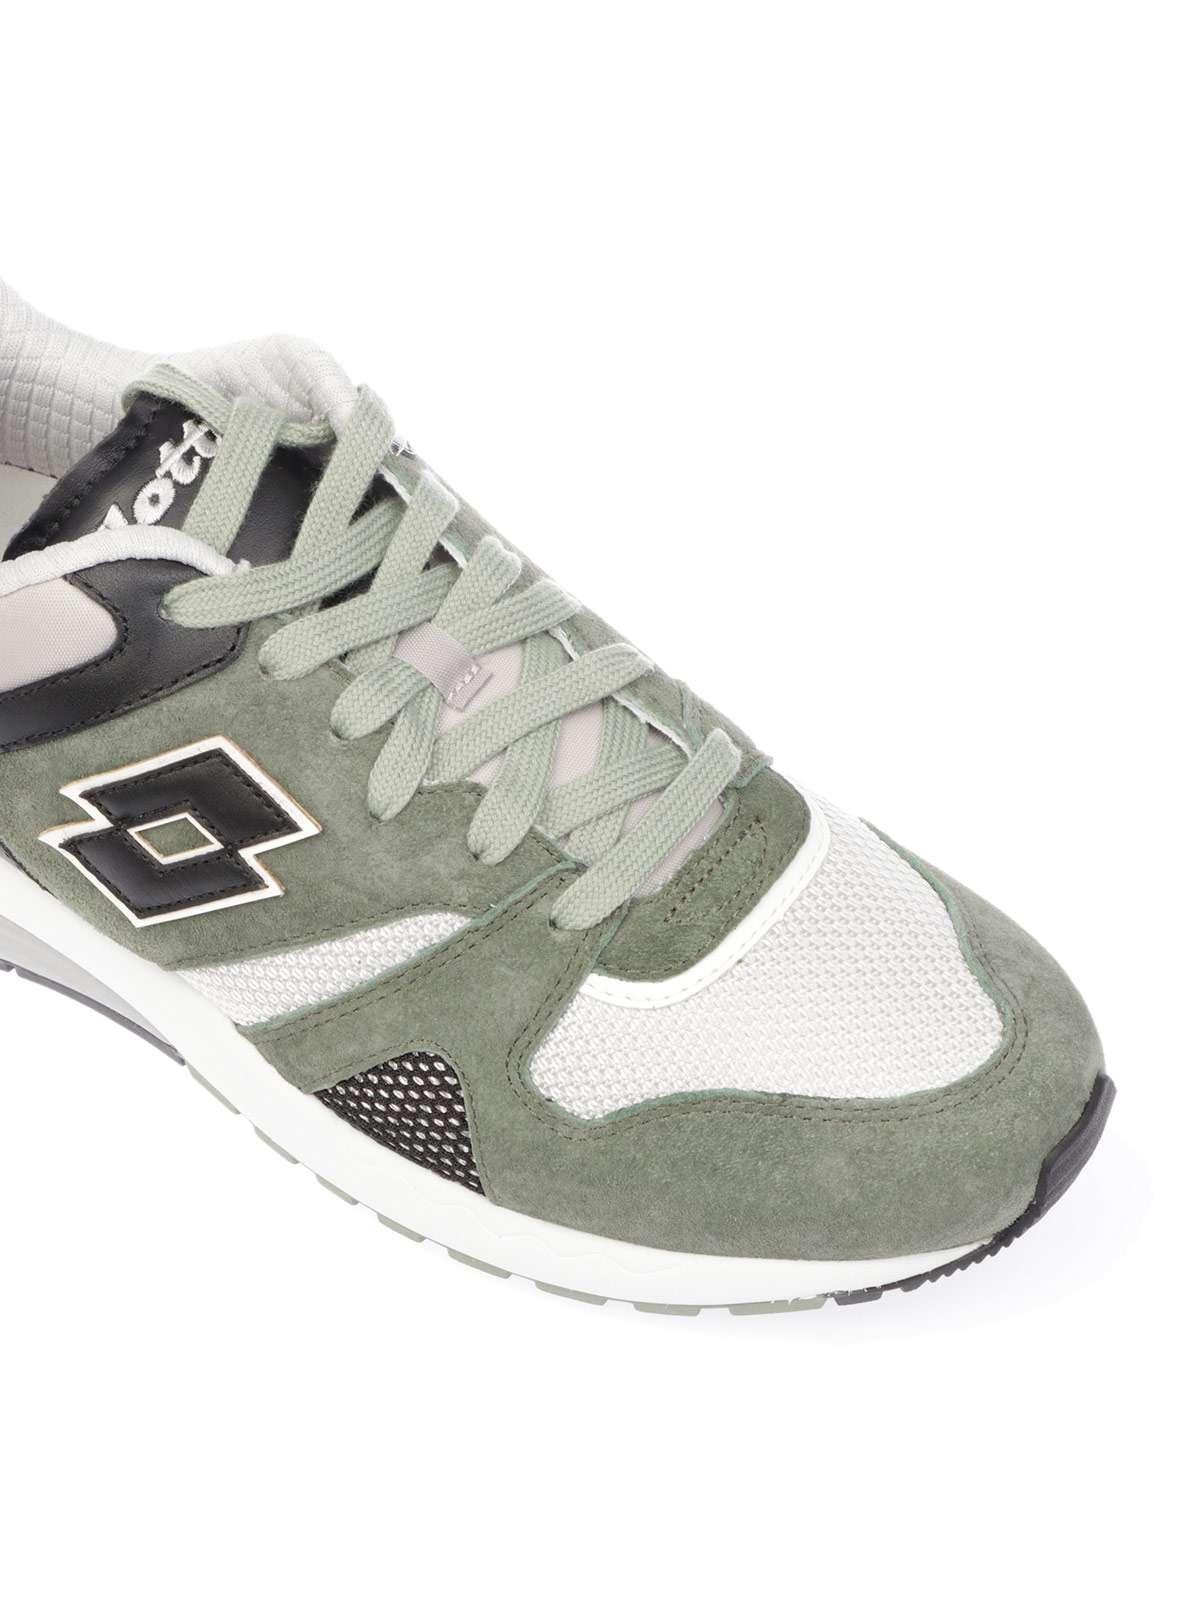 https://www.parmax.com/media/catalog/product/a/i/AI-outlet_parmax-scarpe-uomo-Lotto-211149-D.jpg